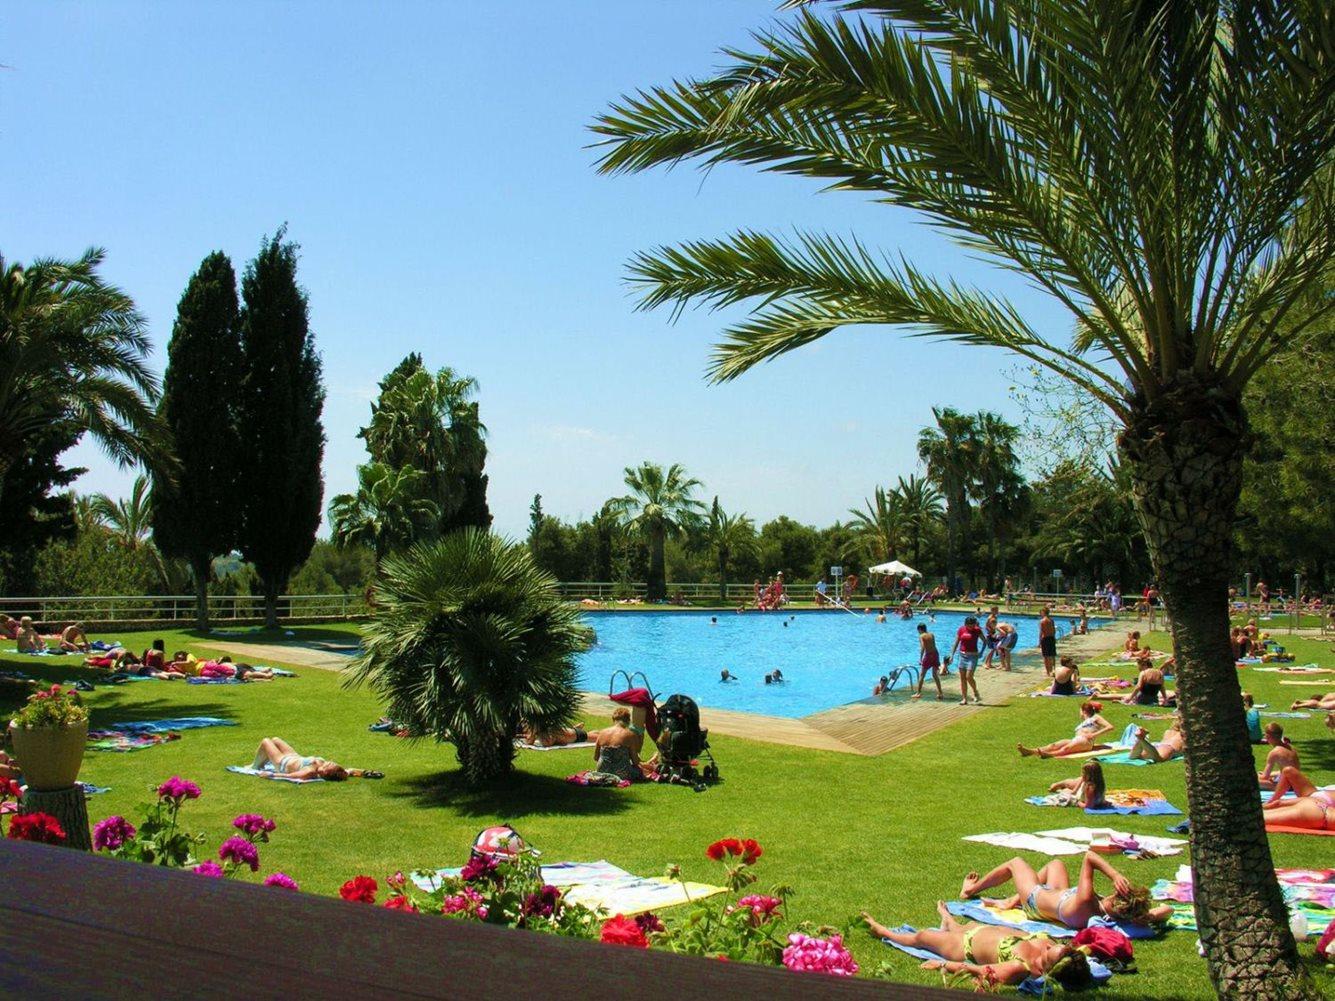 Zwembad Camping Vilanova Park - Campings aan de Costa Dorada